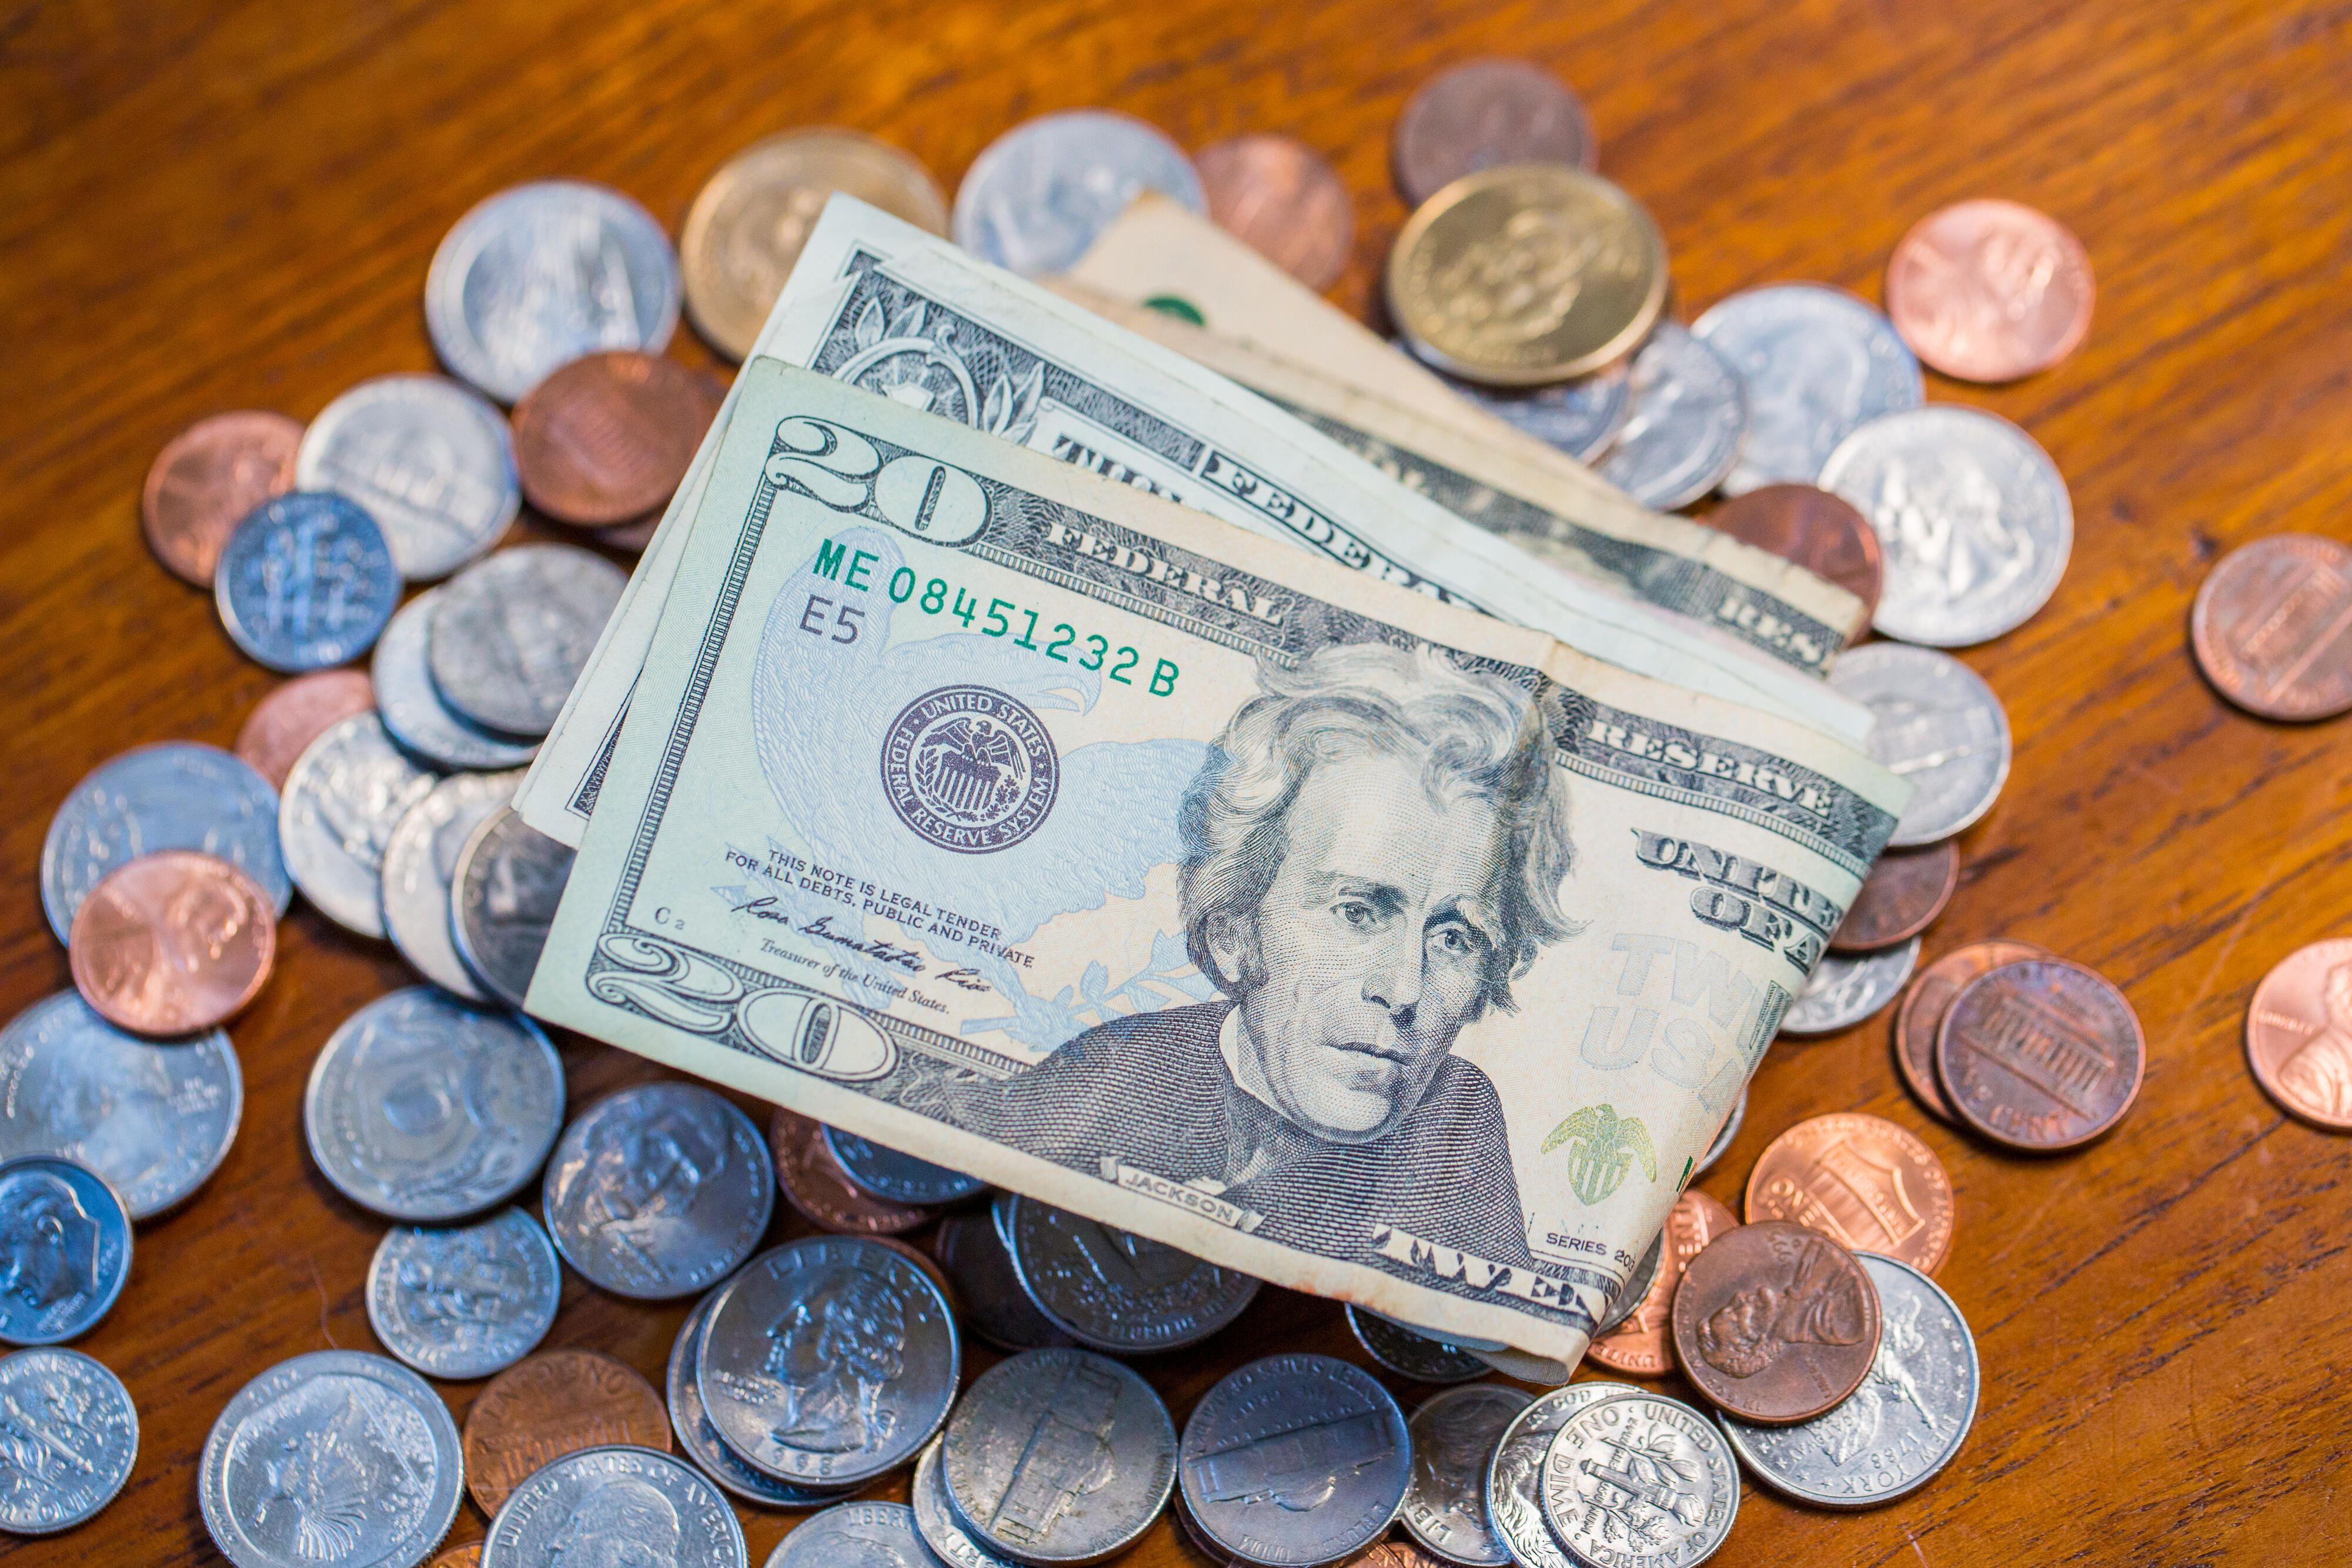 money-bills-coins-wallet-0538